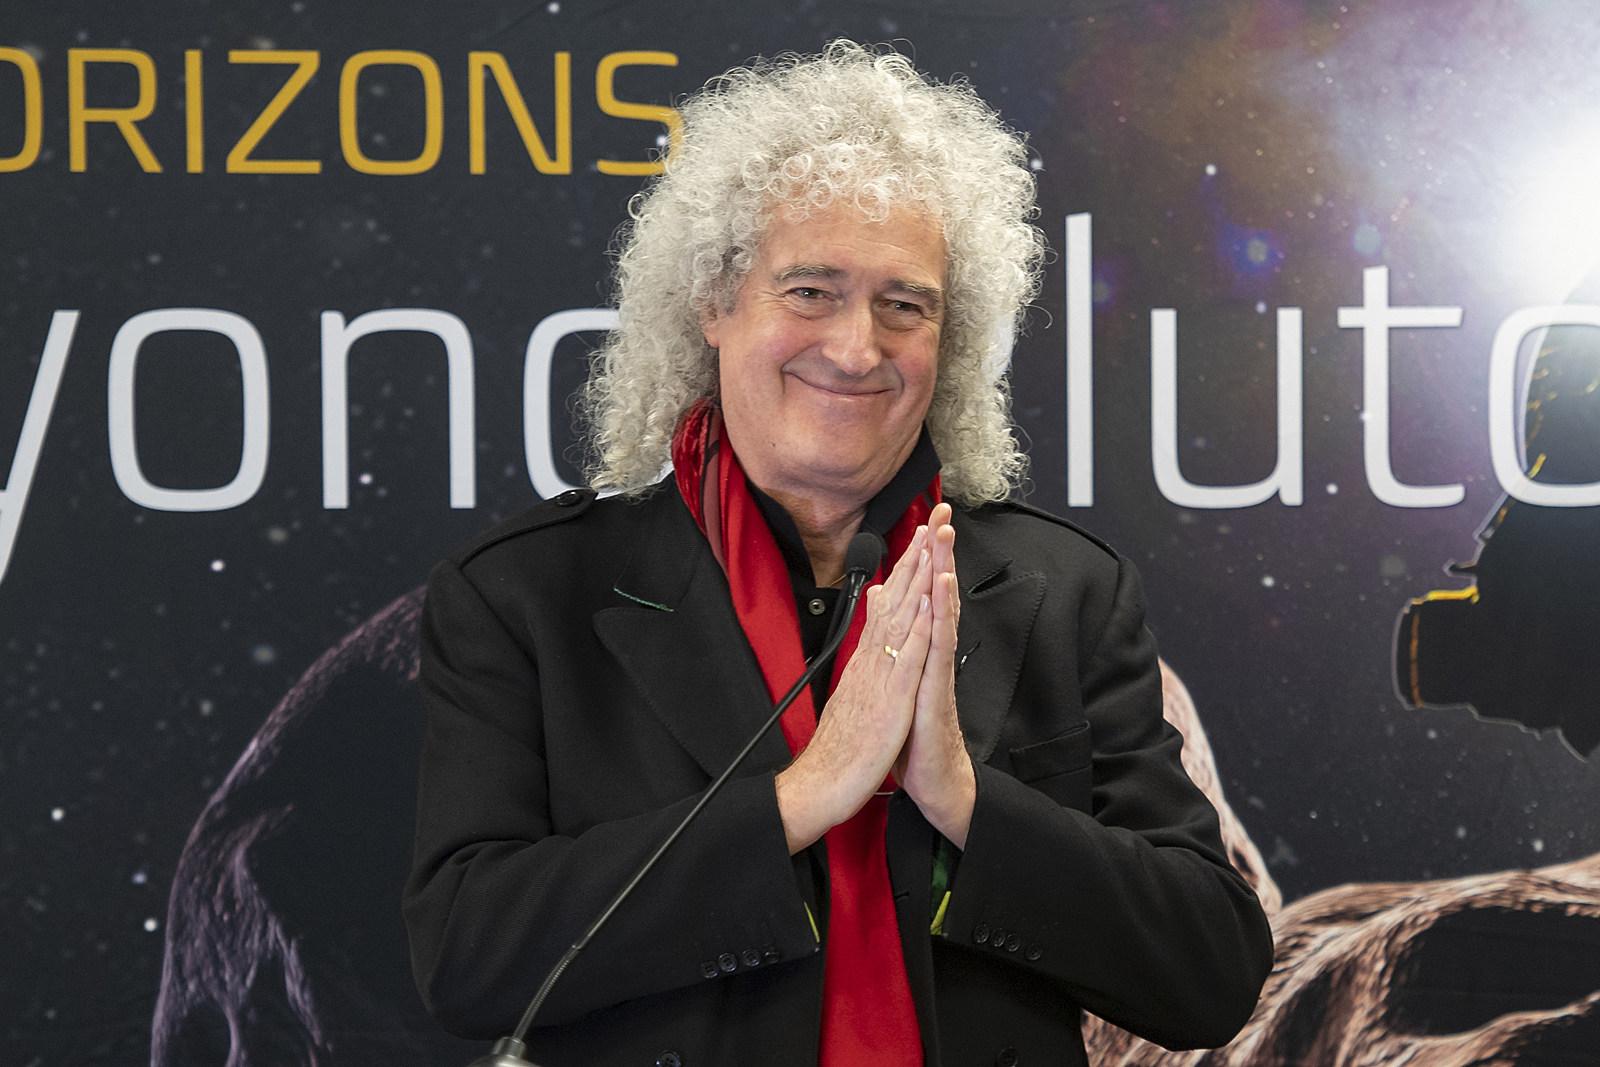 Listen to Brian May's New Single, 'New Horizons'